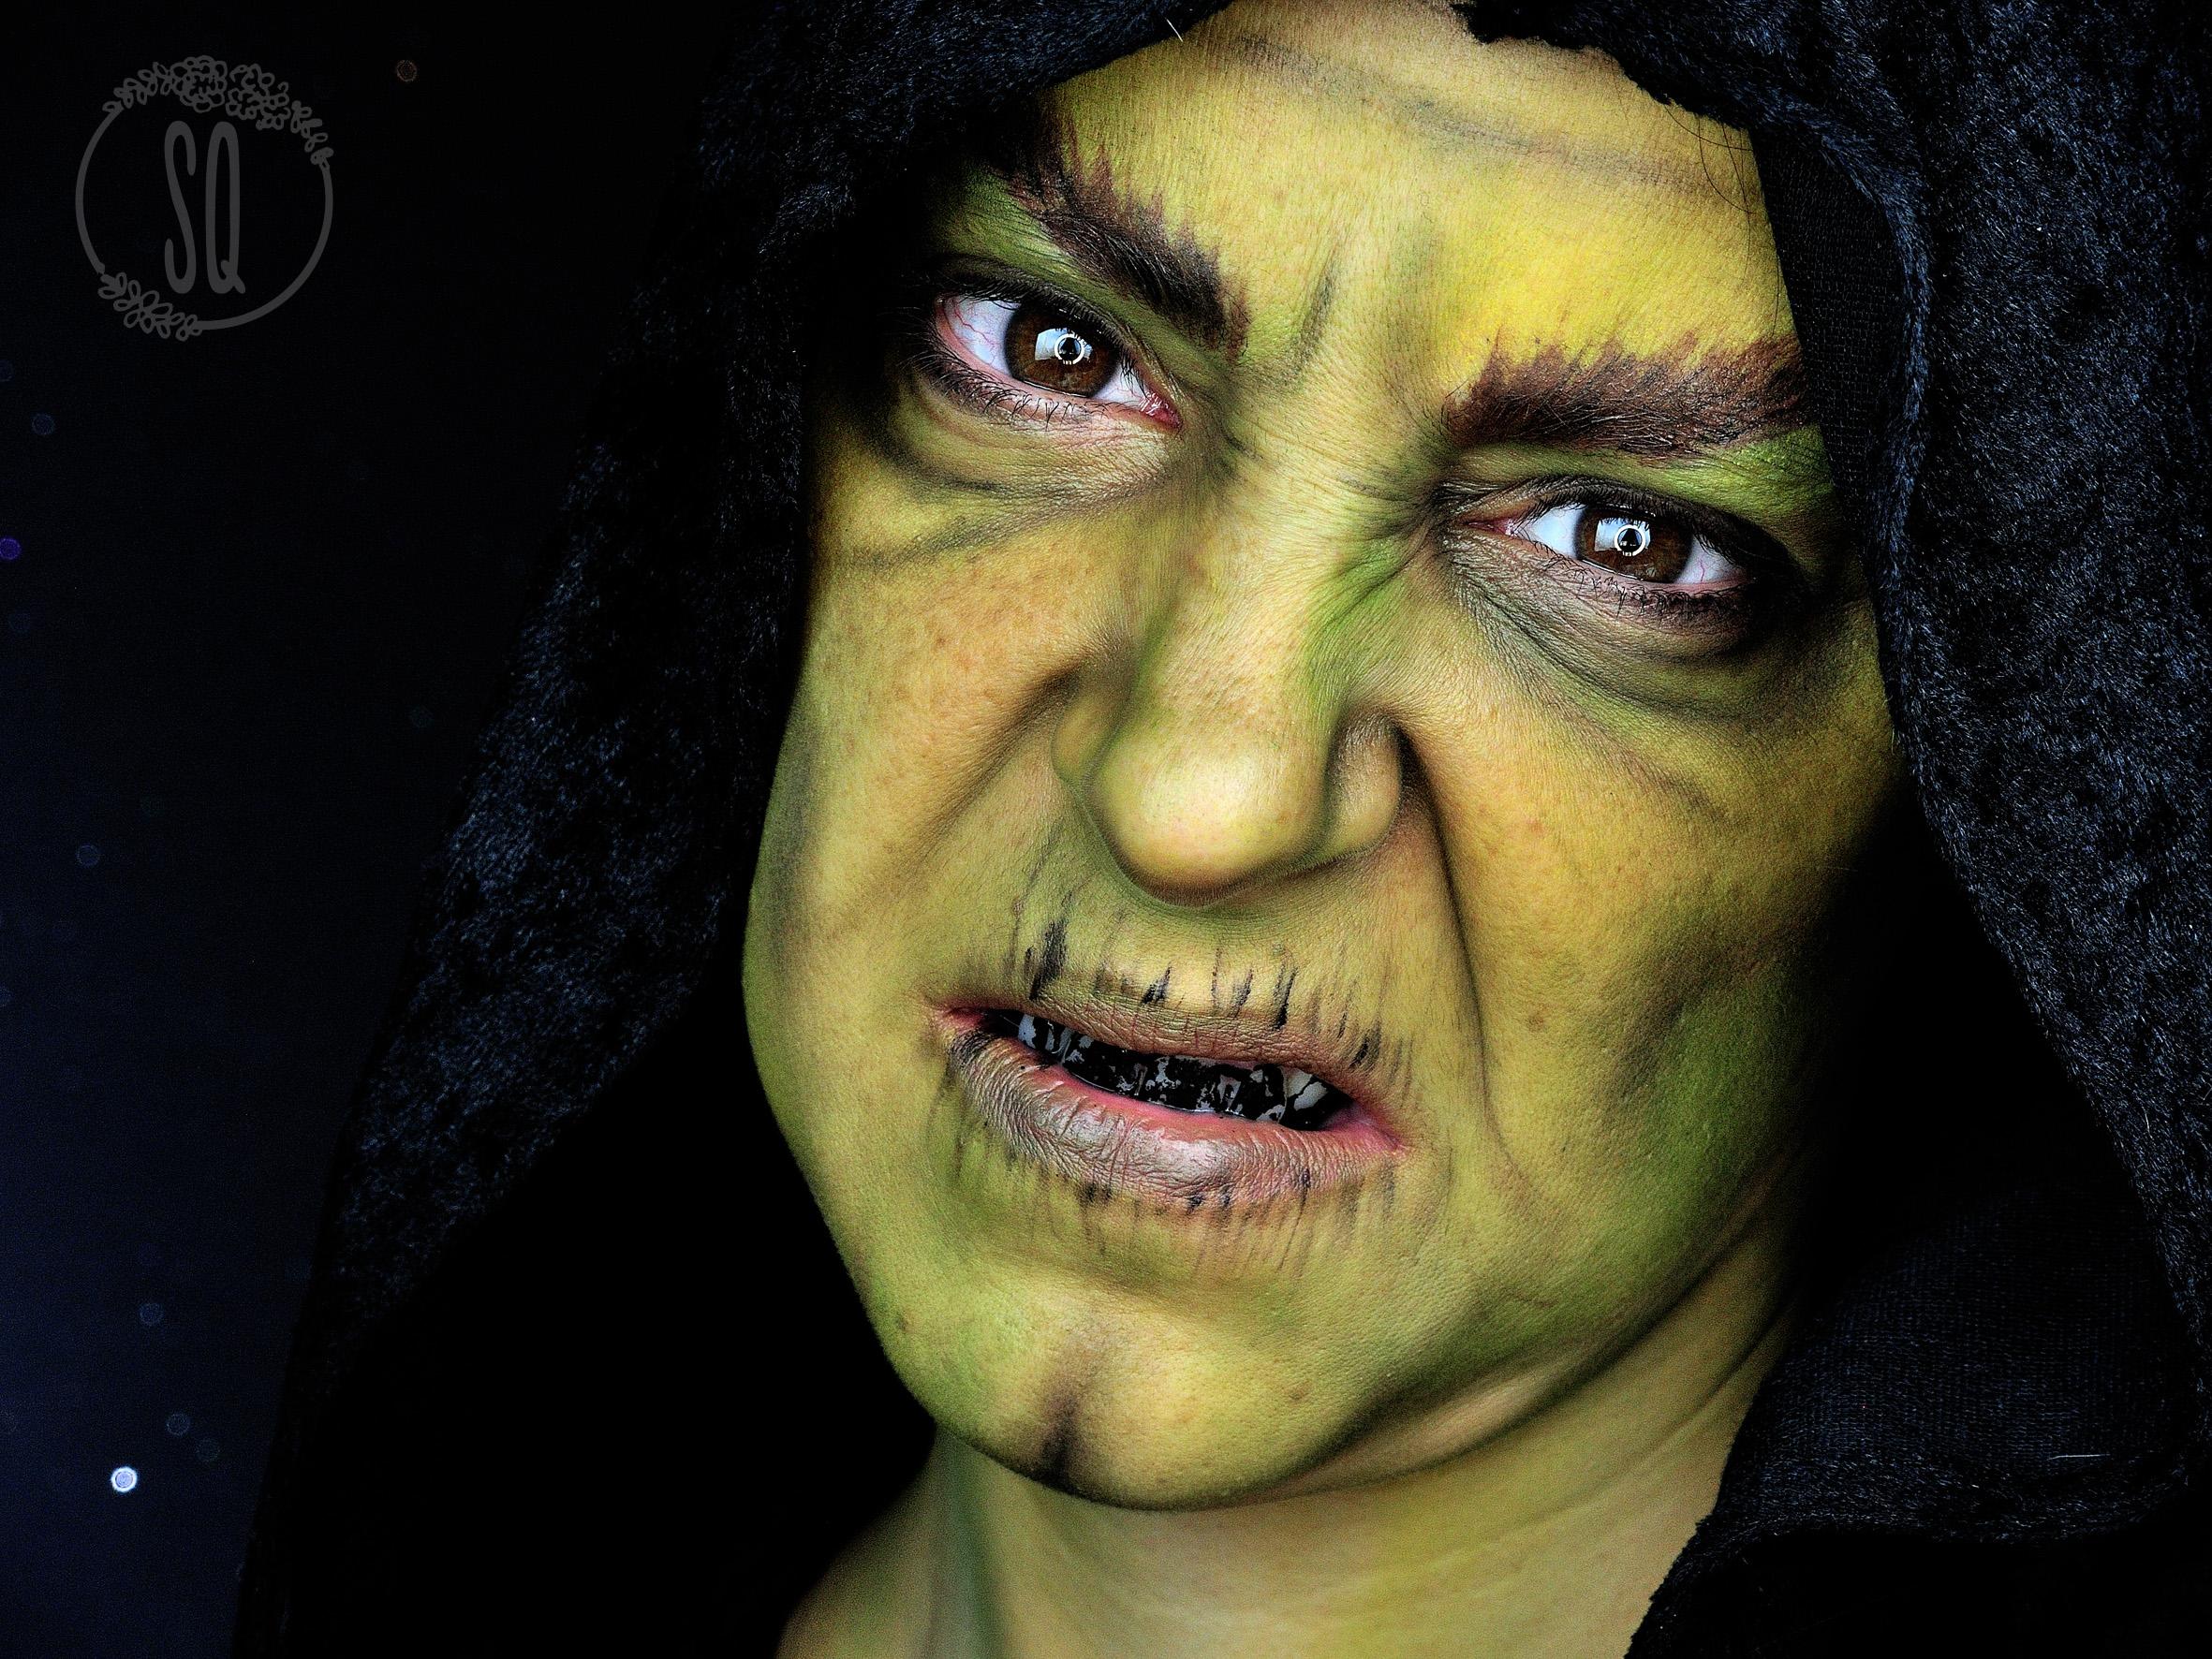 tutorial maquillaje bruja tutorial maquillaje bruja - Maquillaje Bruja